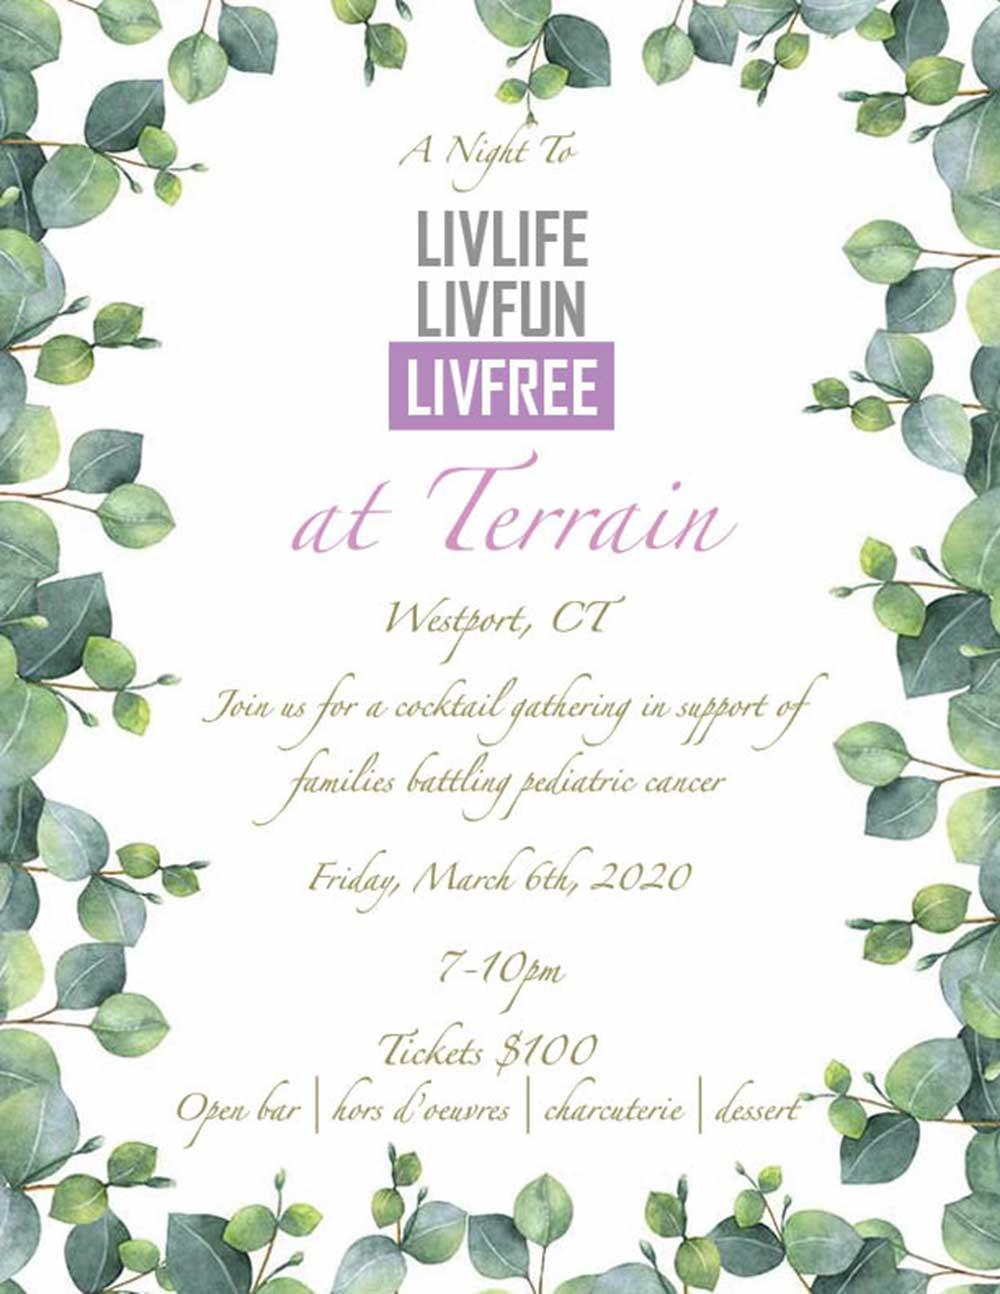 LIVLIFE LIVFUN LIVFREE at Terrain in Westport